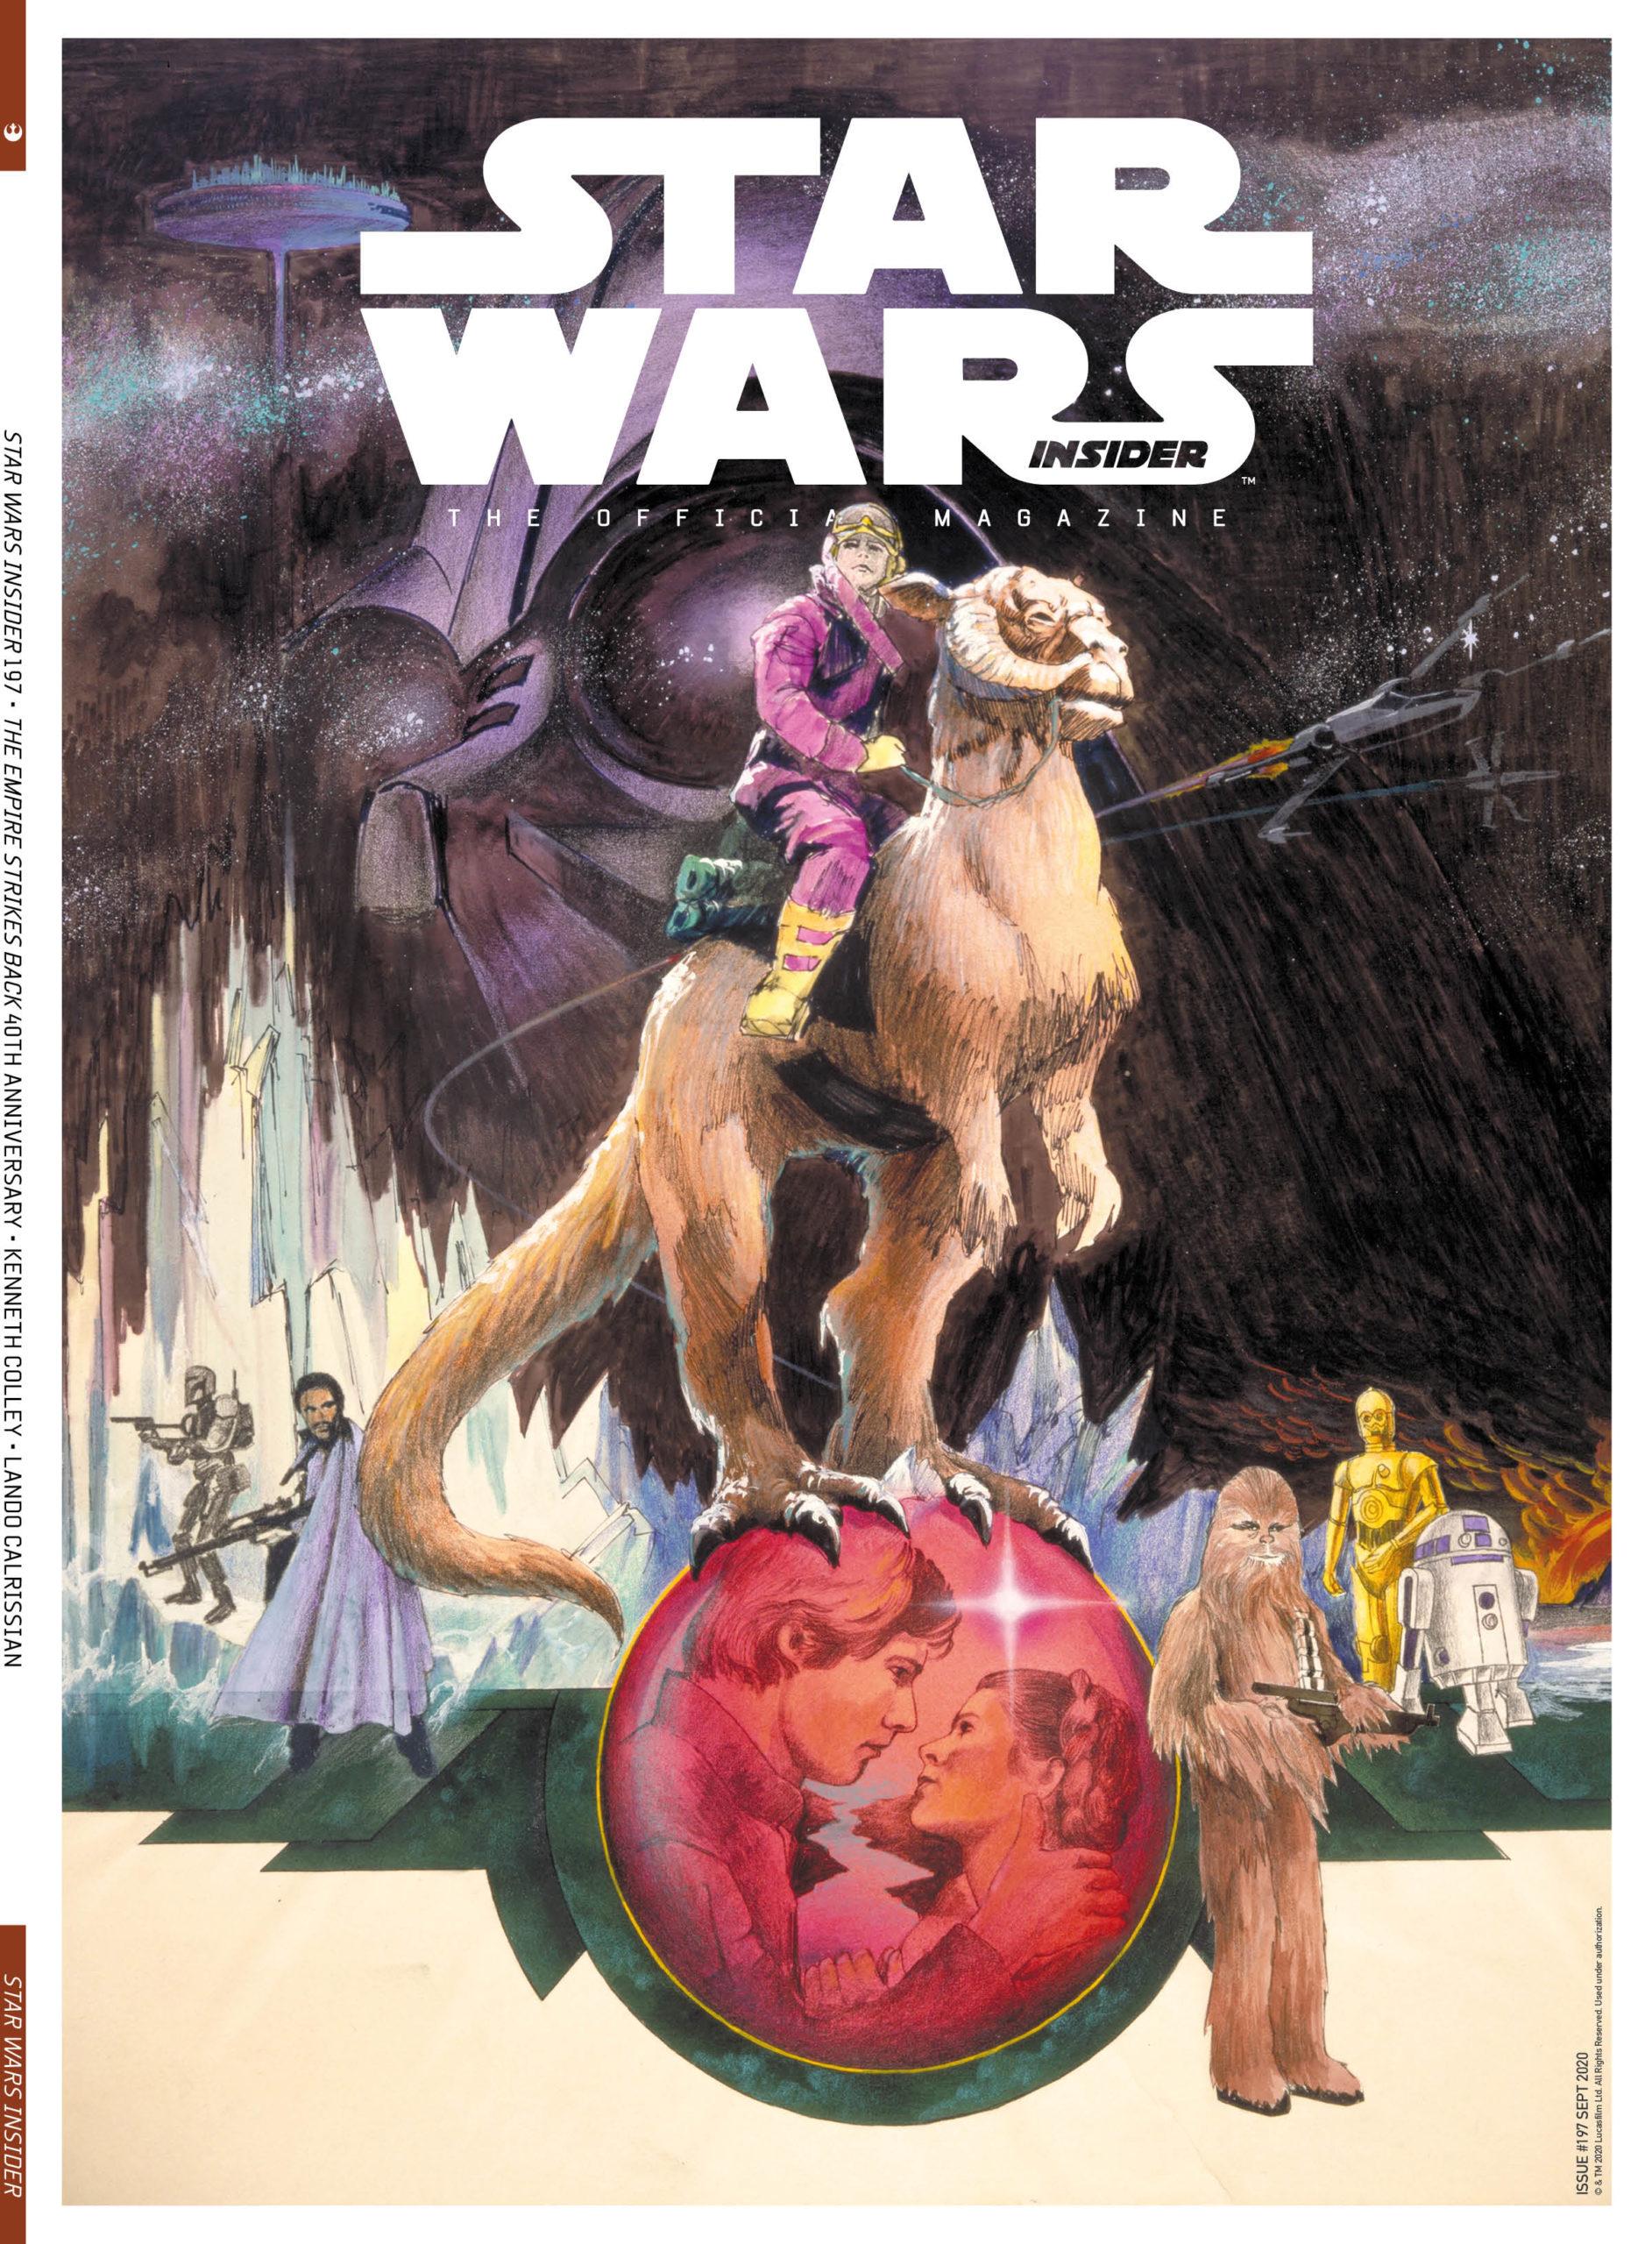 Star Wars Insider #197 (Subscriber Cover) (22.09.2020)